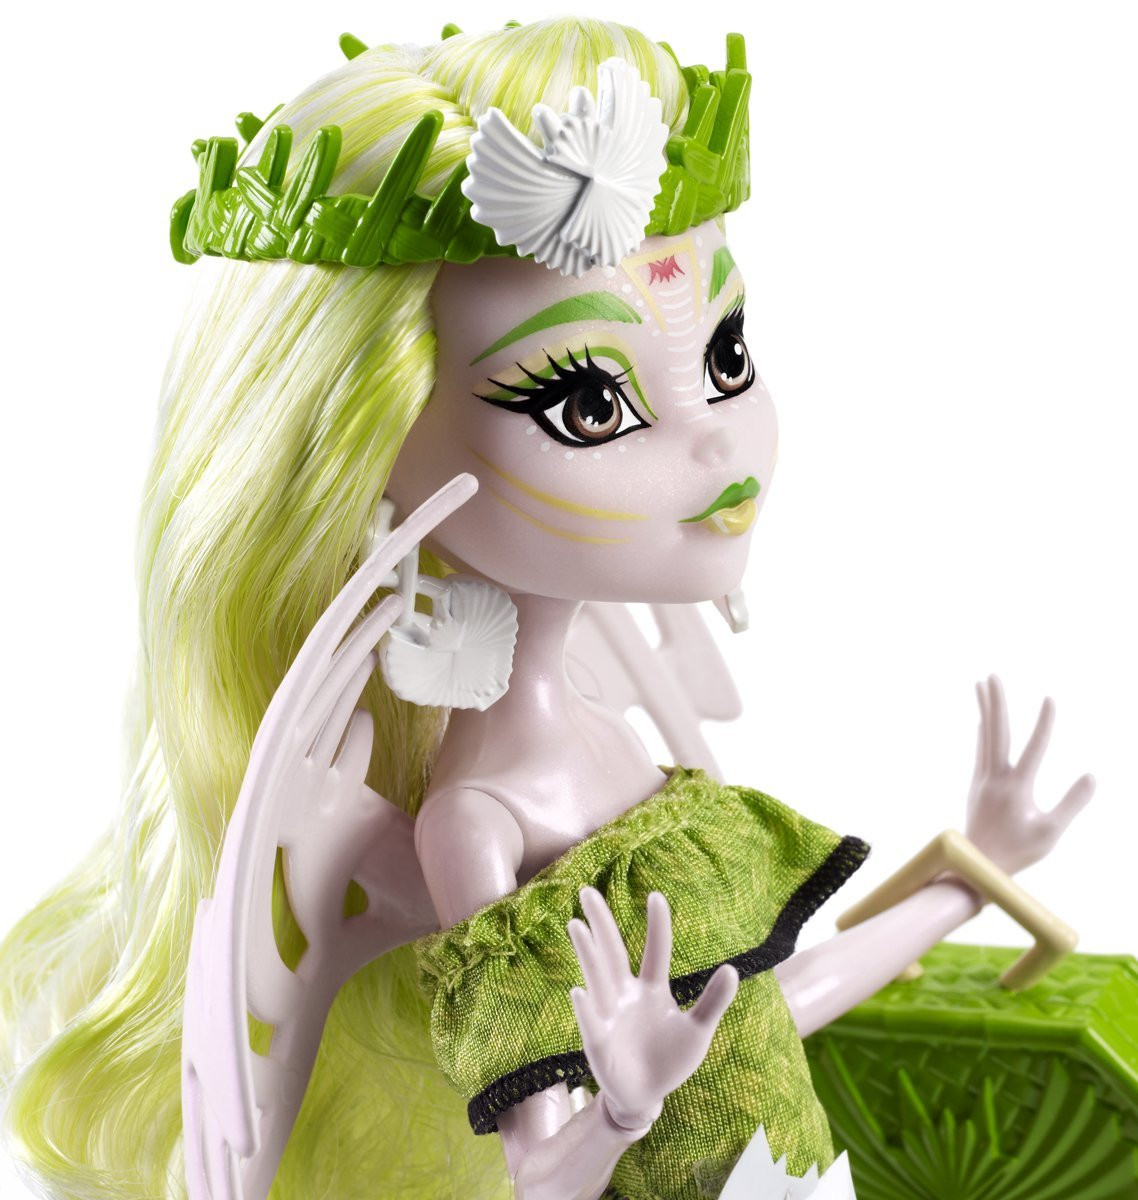 Кукла  Monster High Batsy Claro Монстер хай оригинальная Бэтси Кларо серия Бренд-Бу Студенты